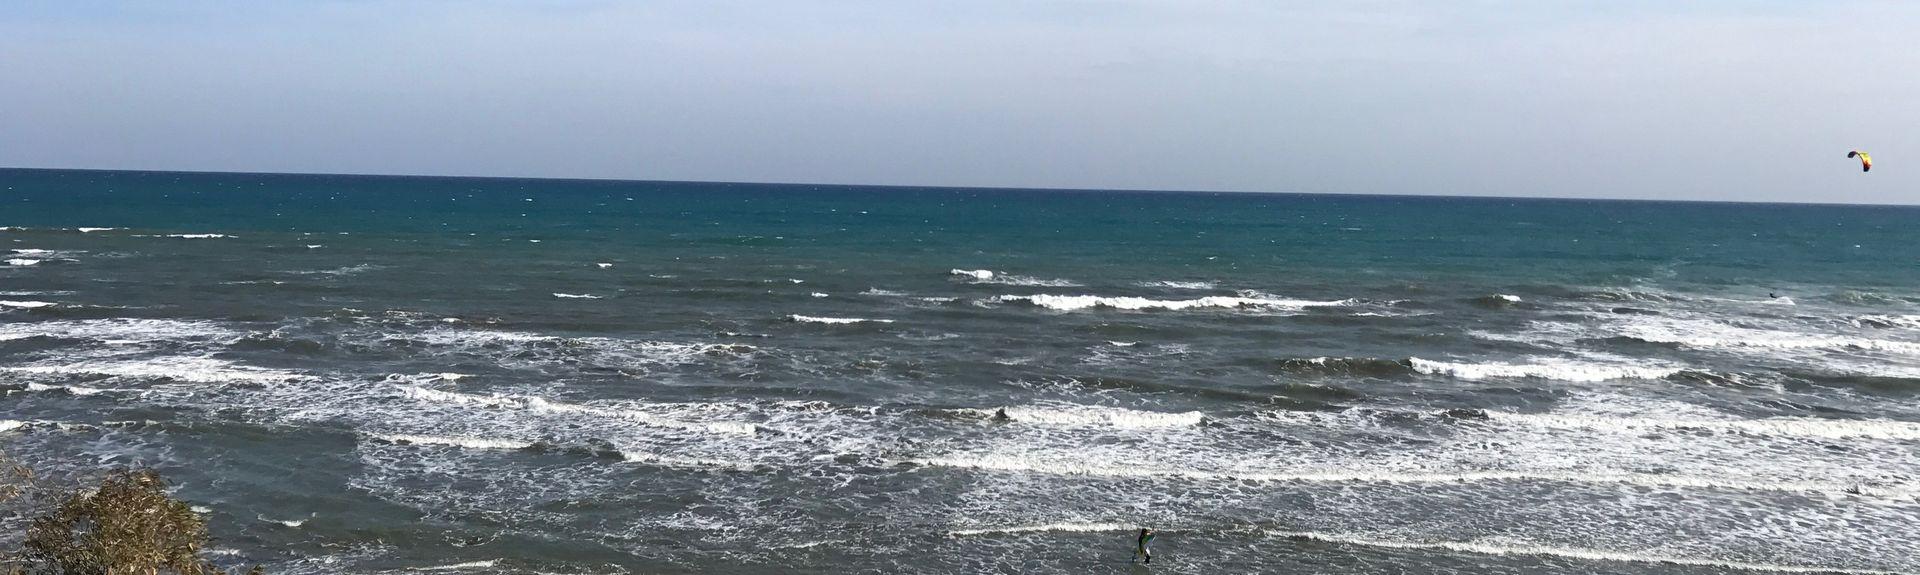 Kiti, Cyprus